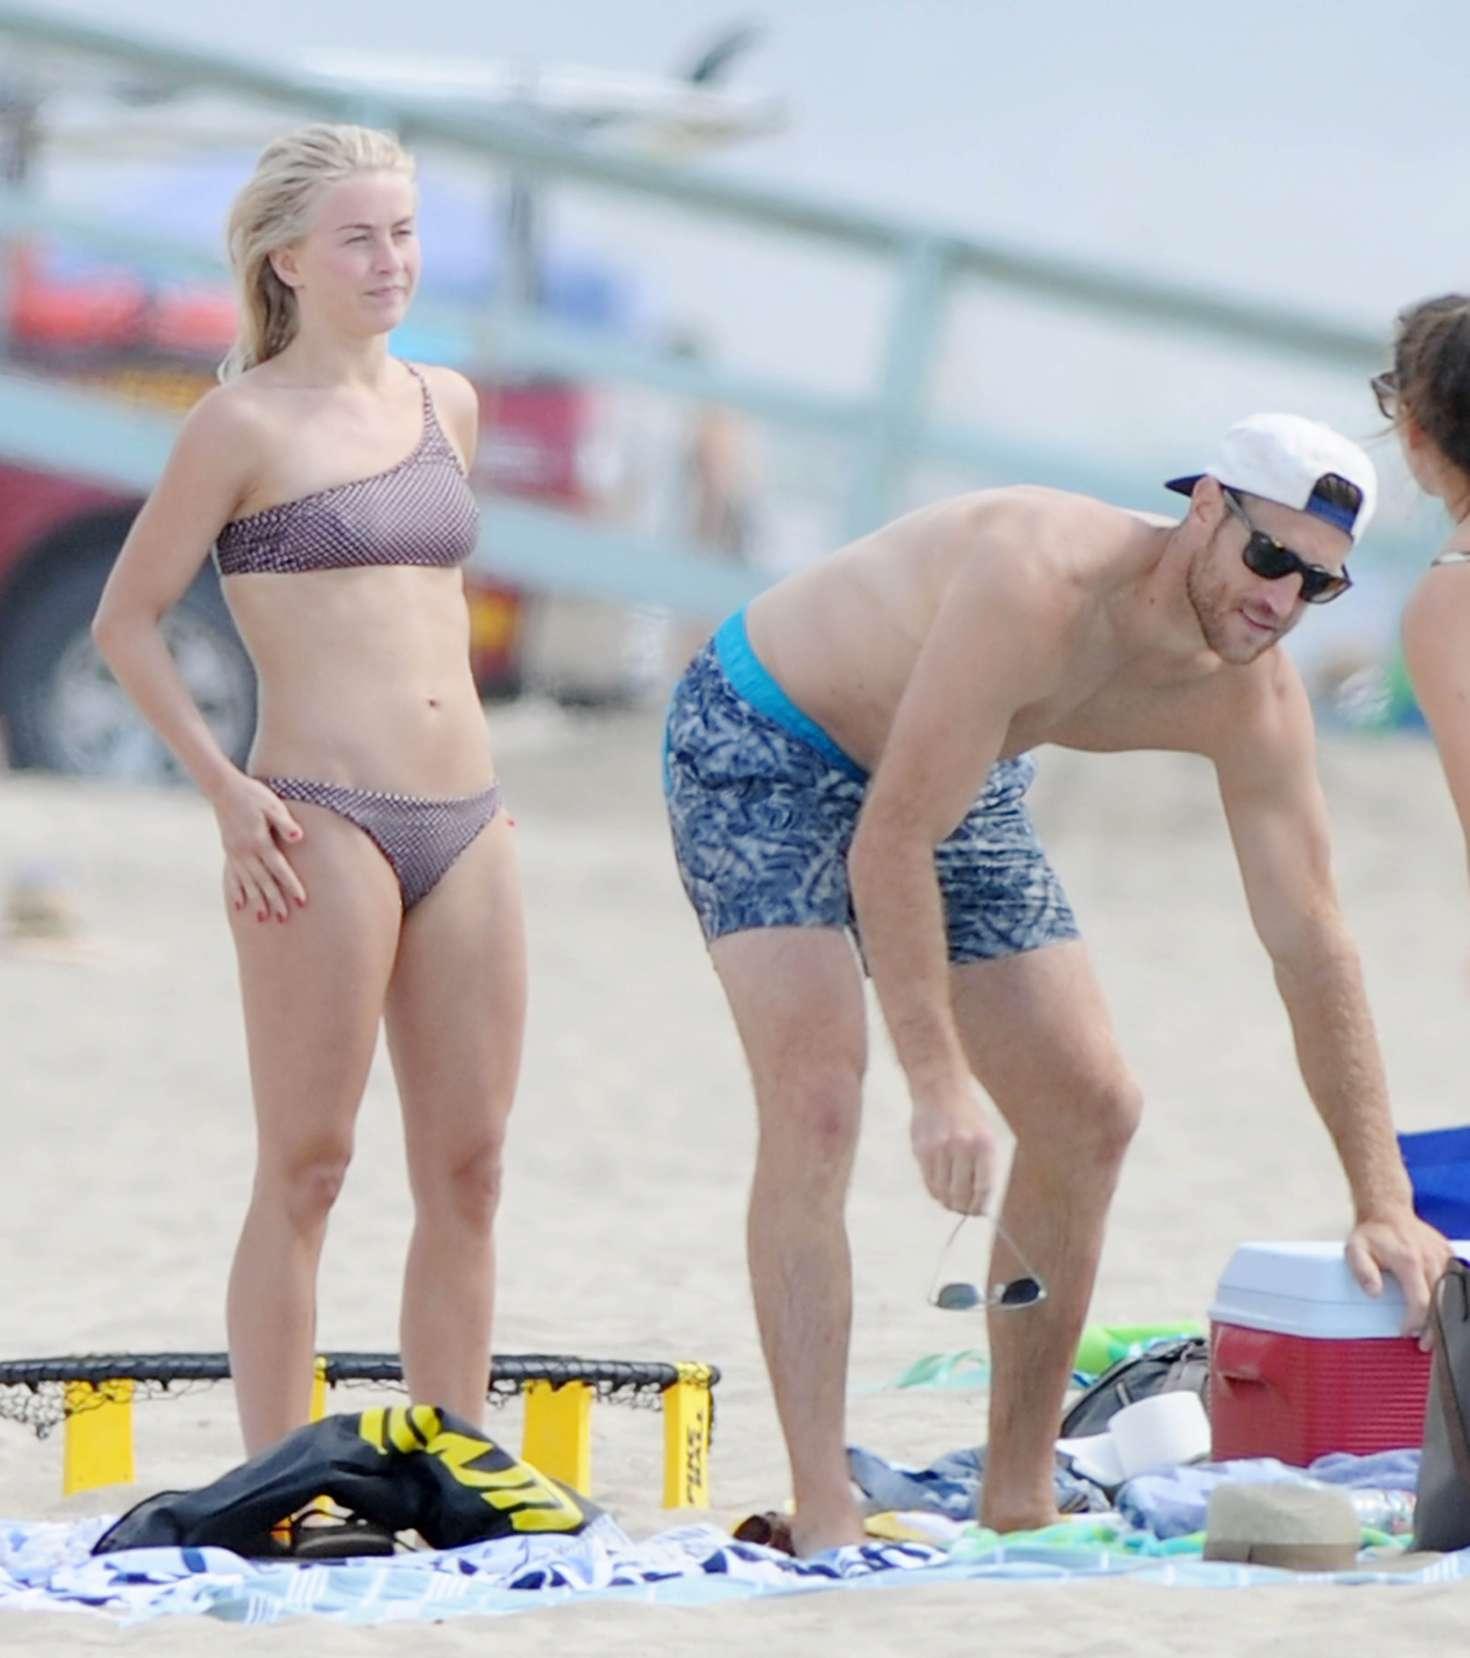 Julianne Hough 2017 : Julianne Hough: Bikini with husband Brooks Laich at the beach in Manhattan Beach-21